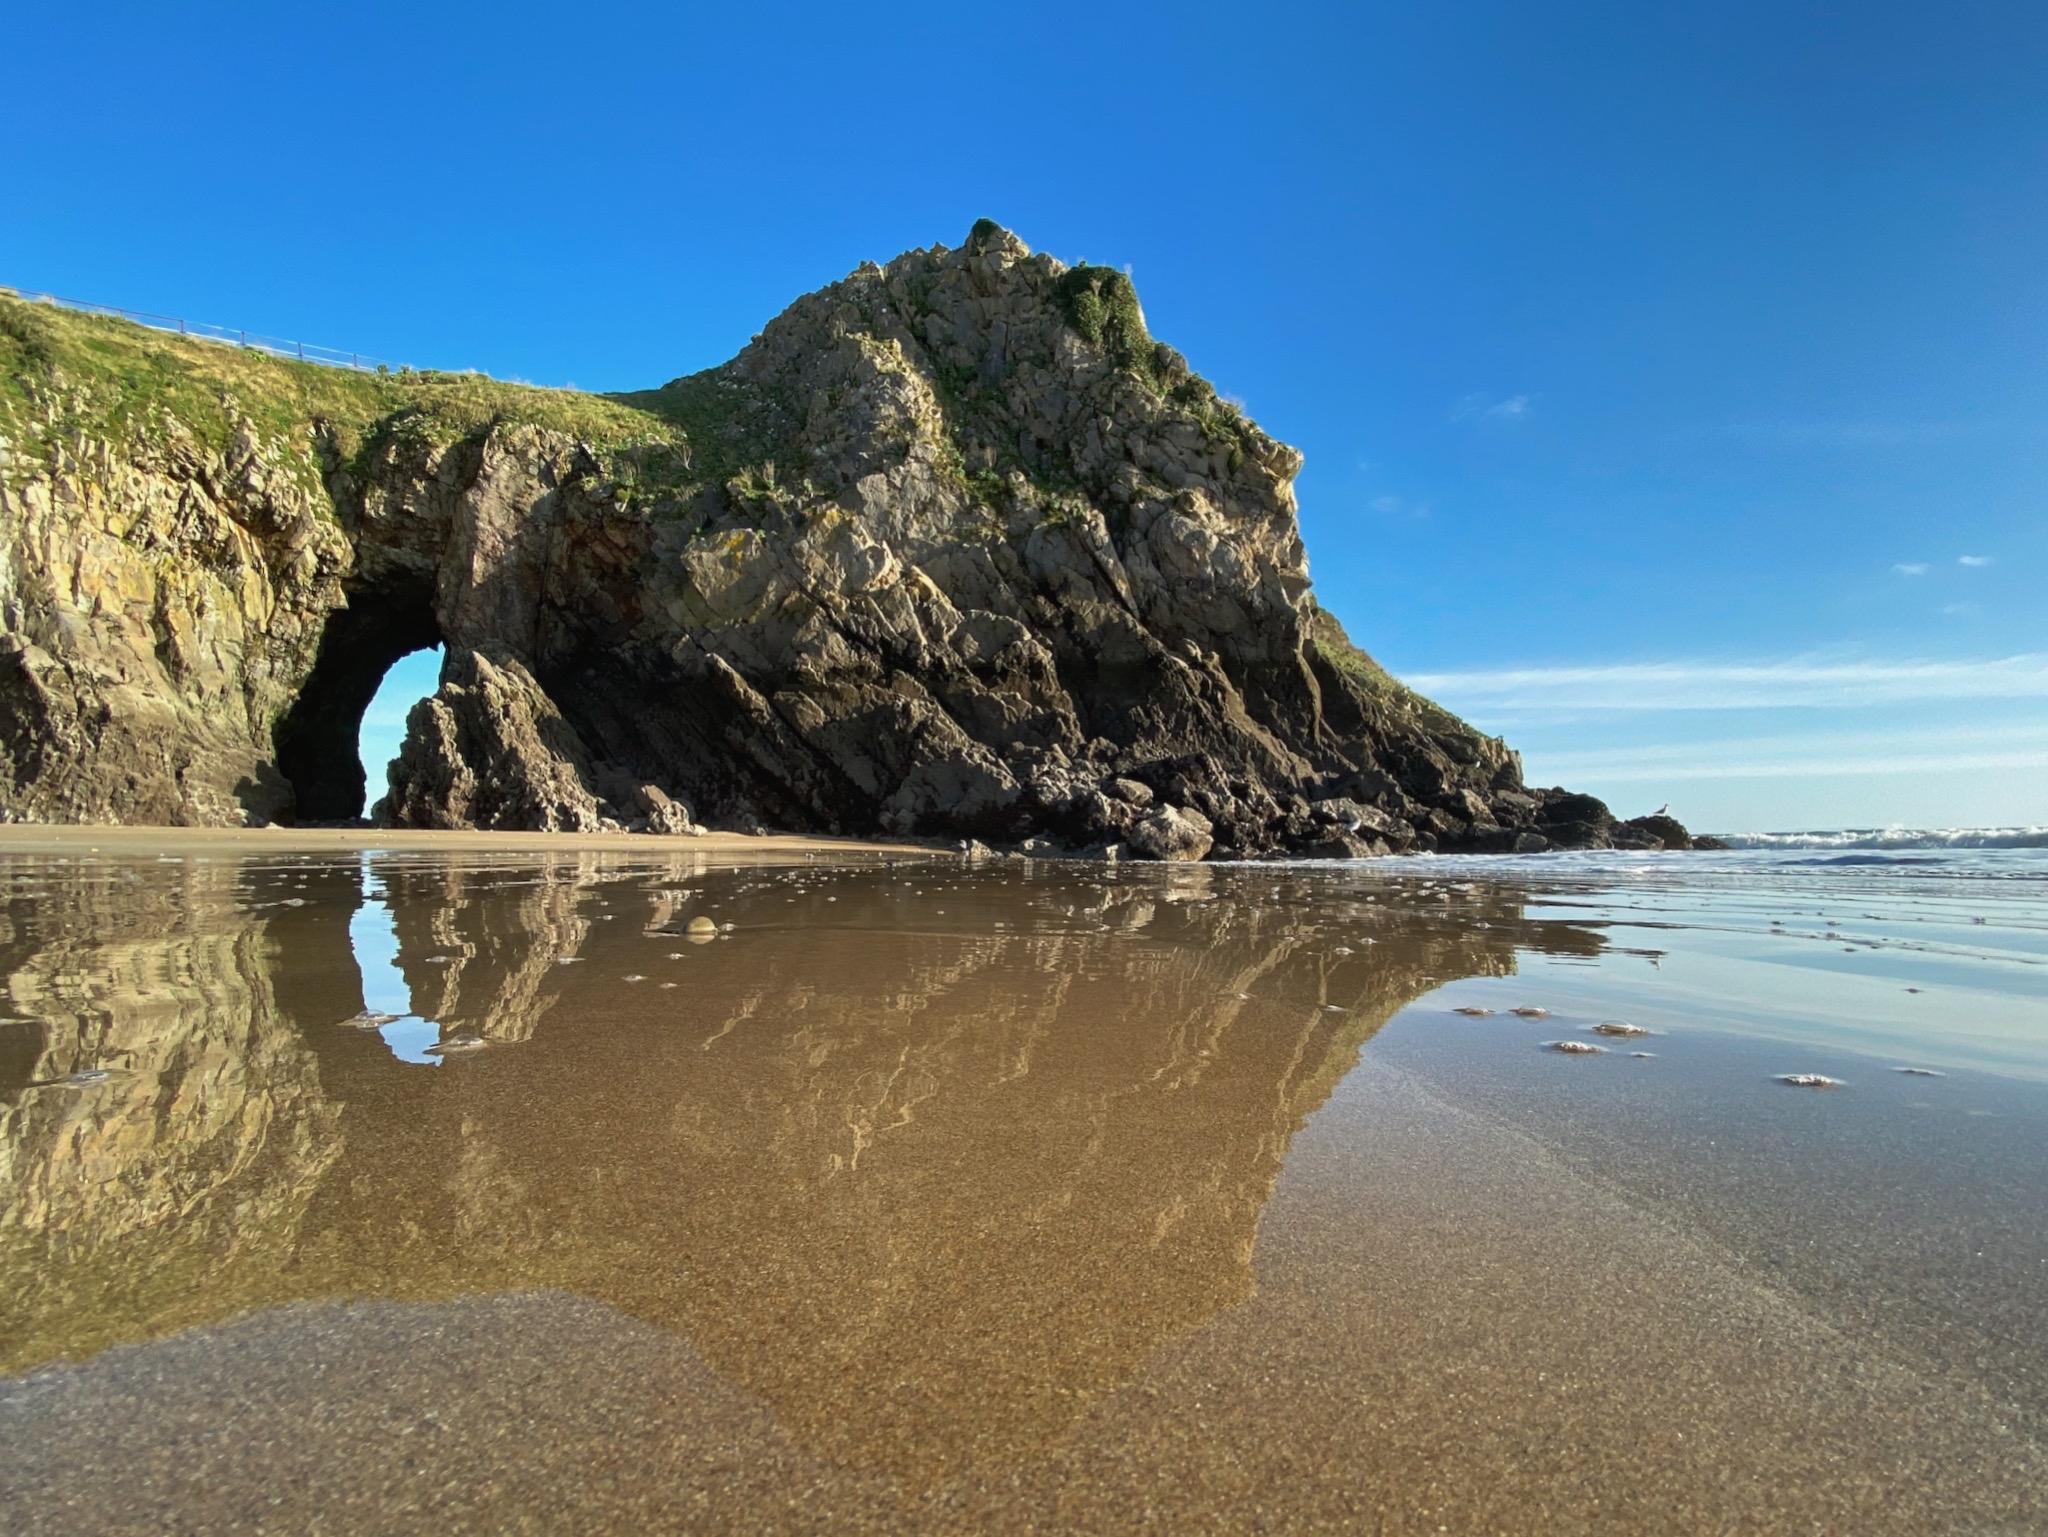 Caldey island reflected in the sand on a beach